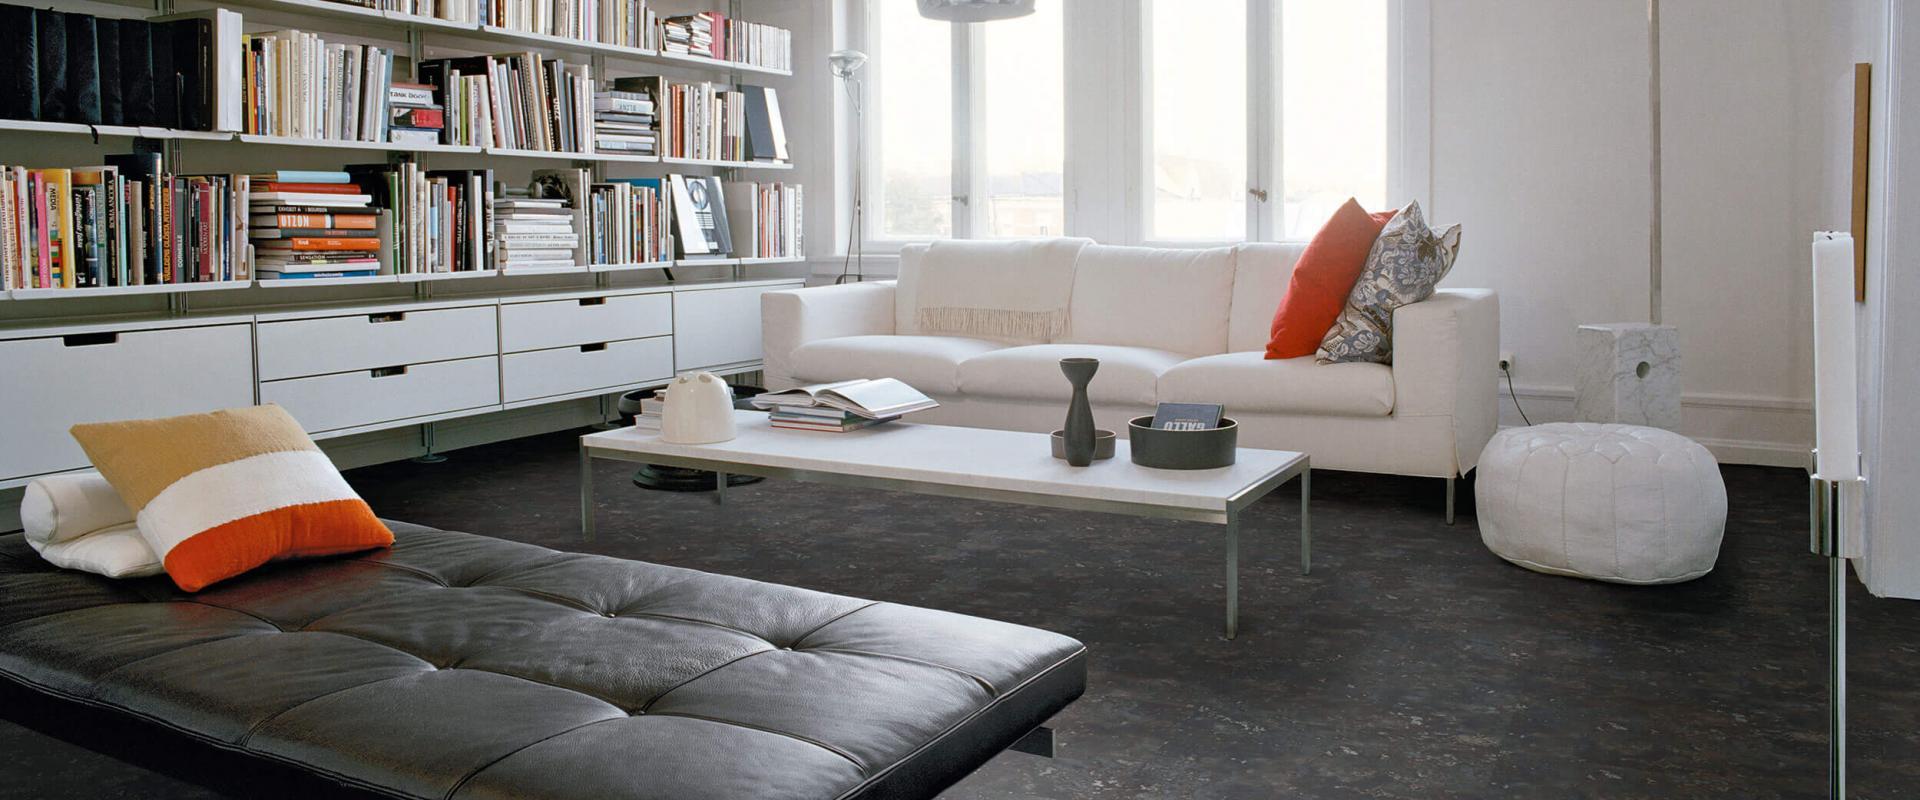 Amtico PVC vloer sfeer